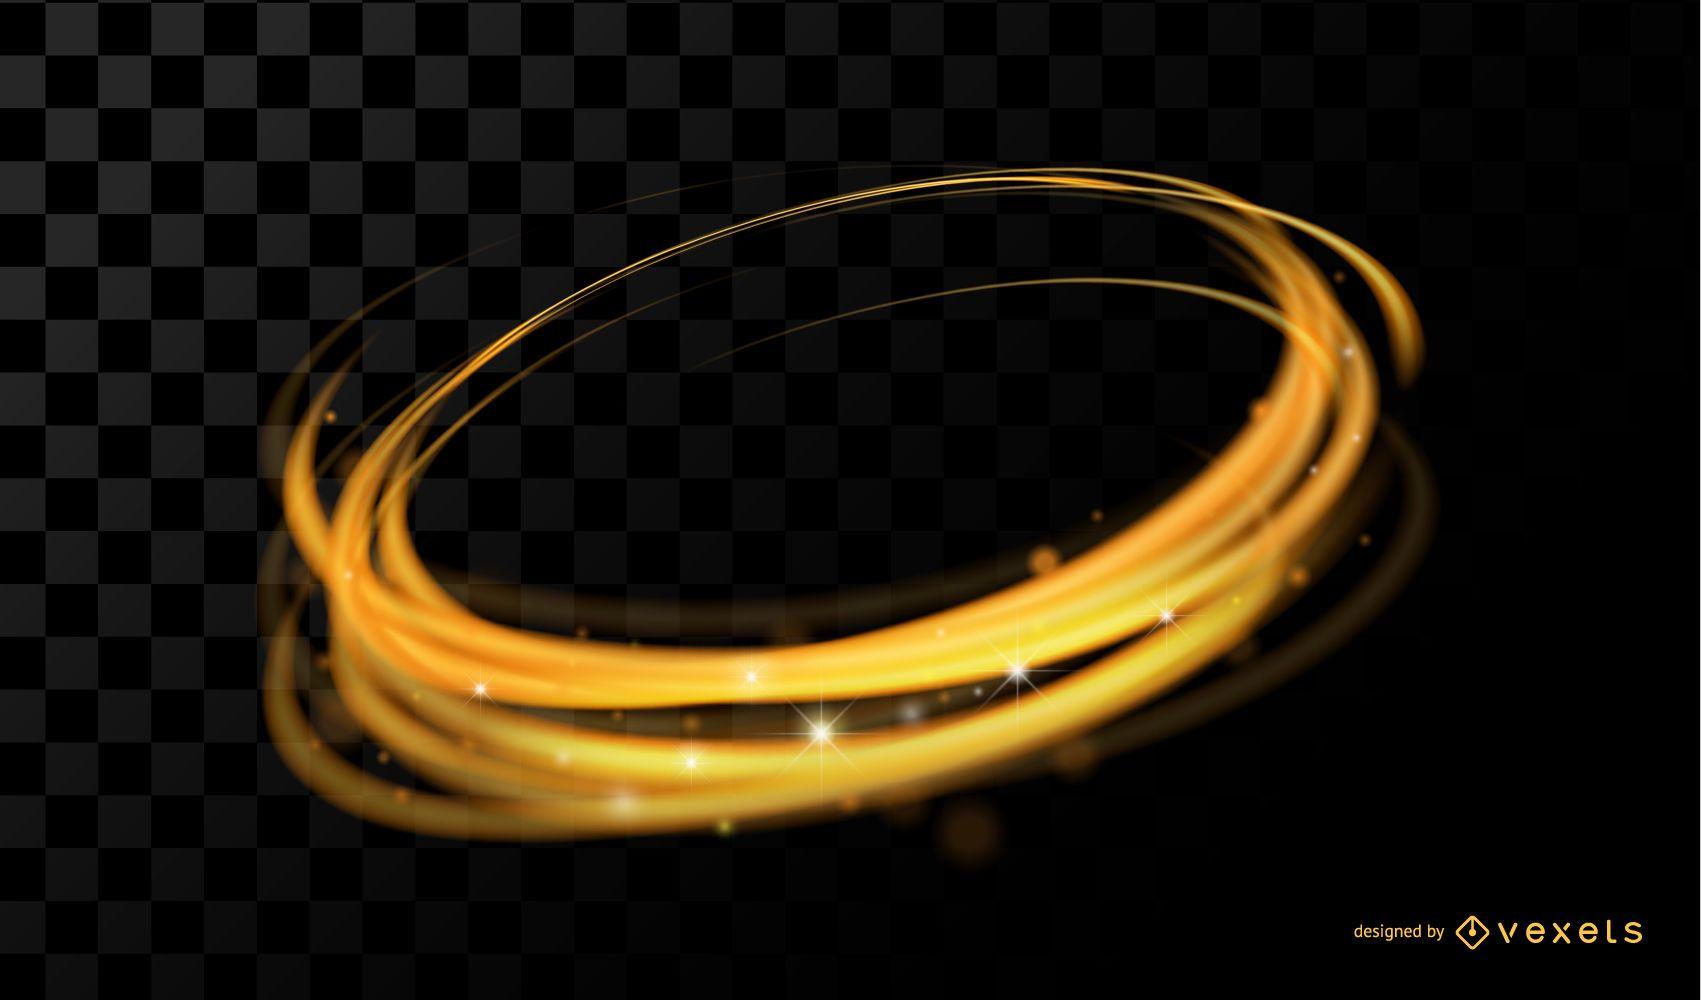 Golden ring background